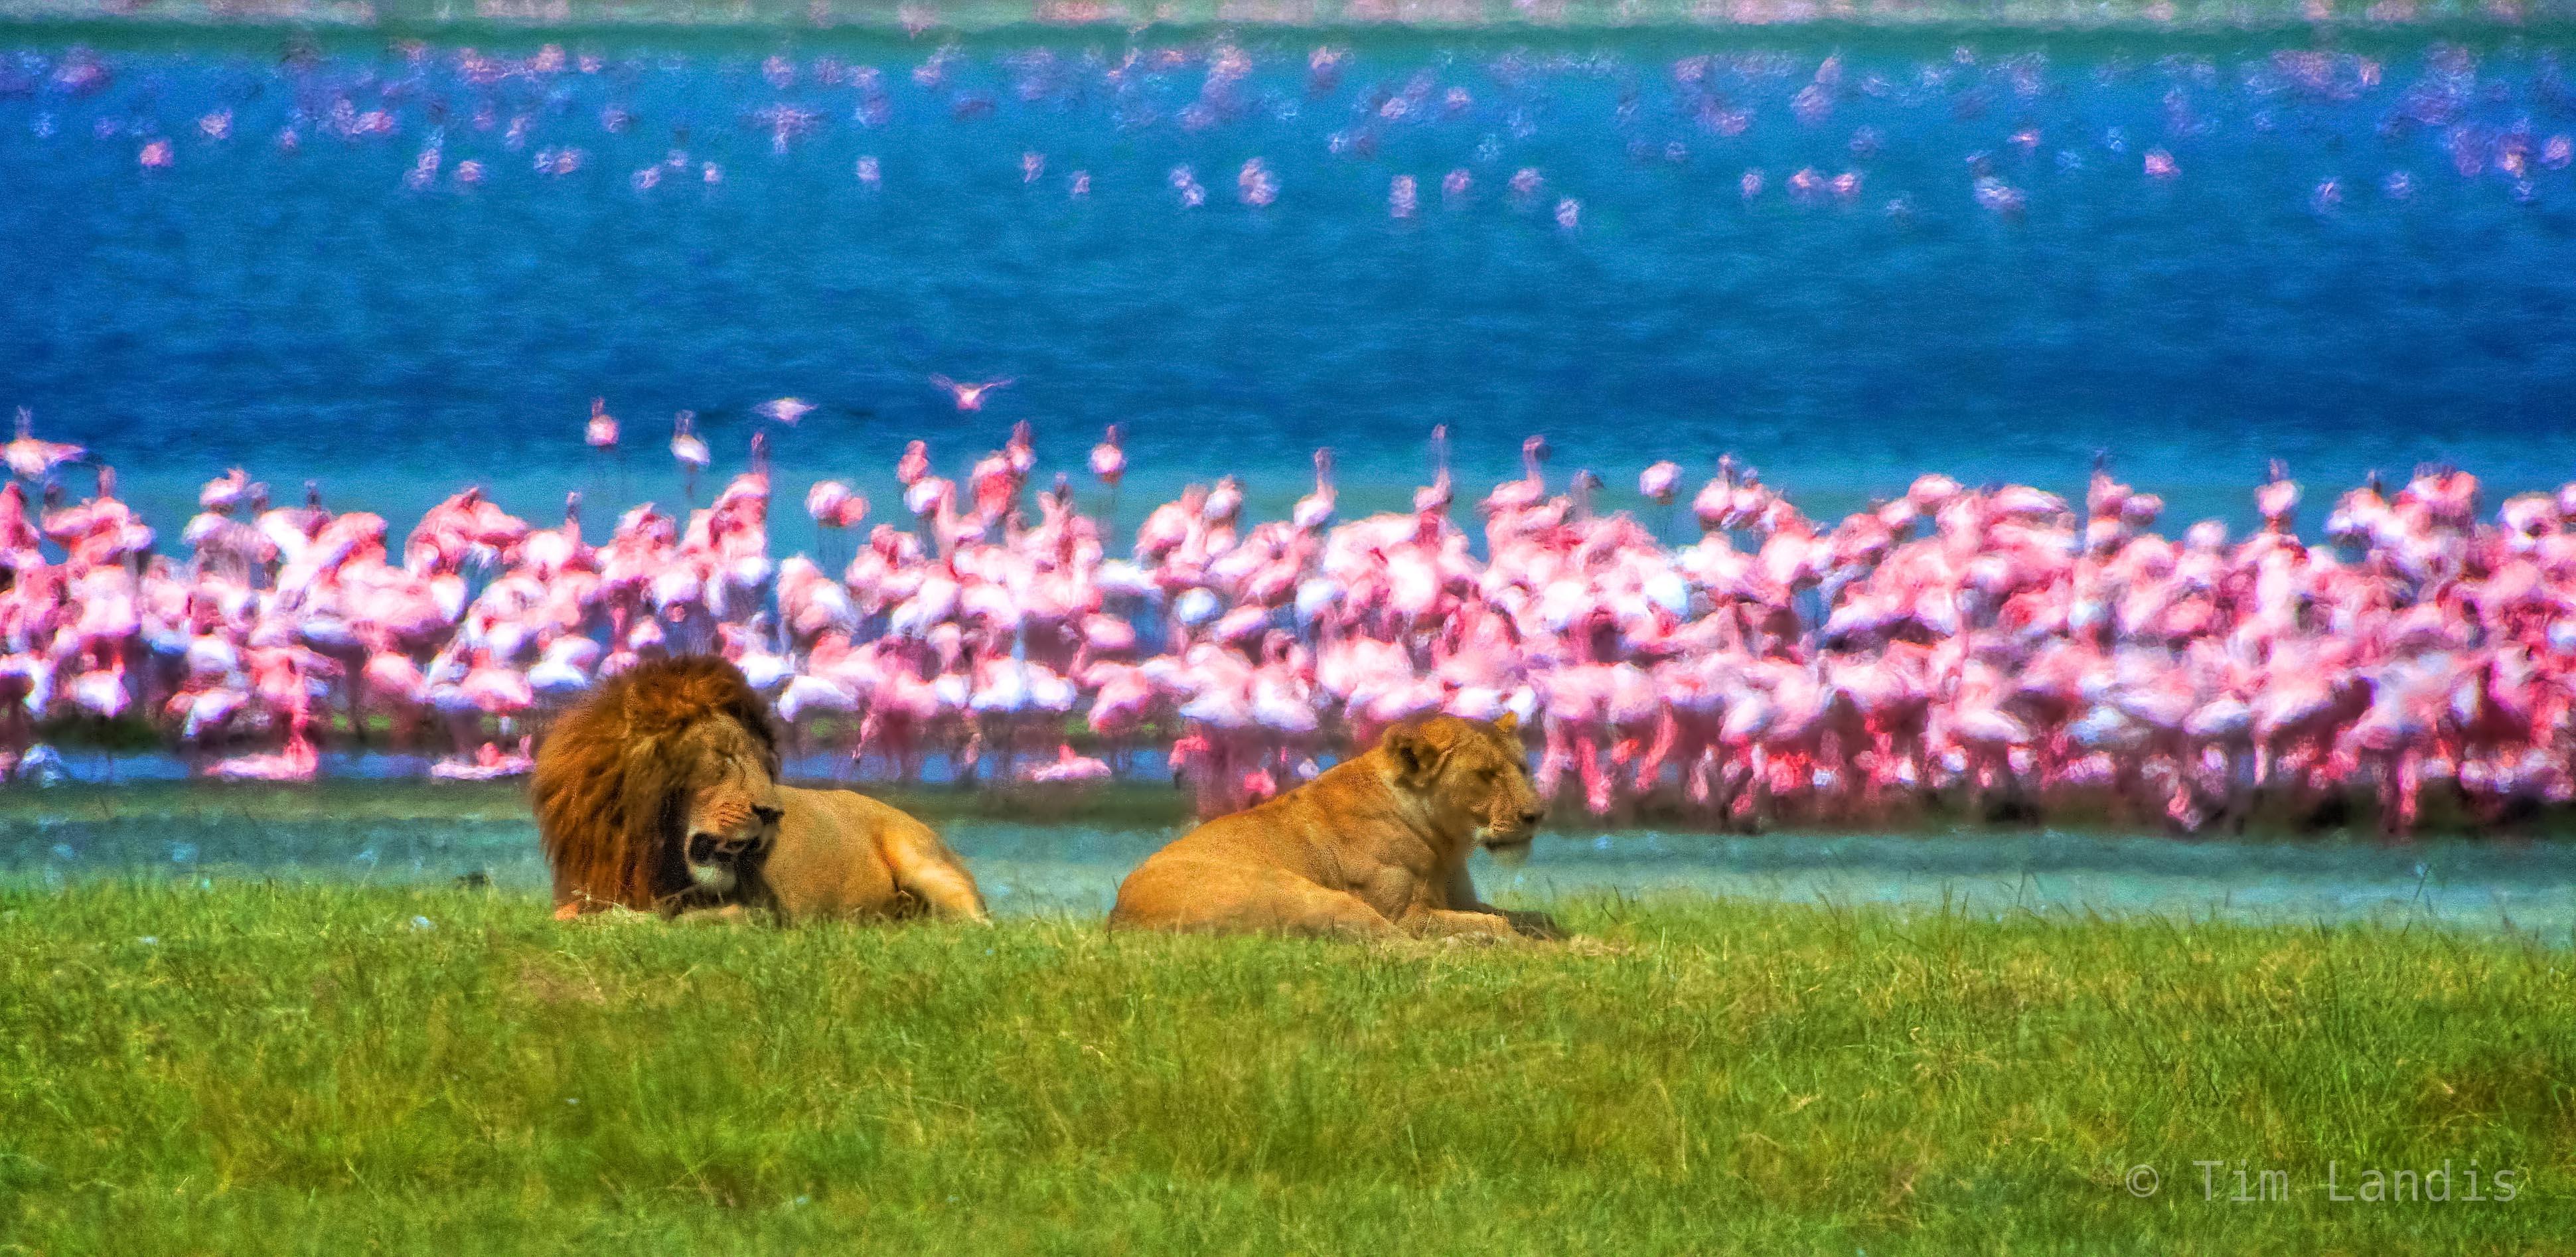 Lions in love, lions before flamingos, nrongrogrongo, salt pan, photo